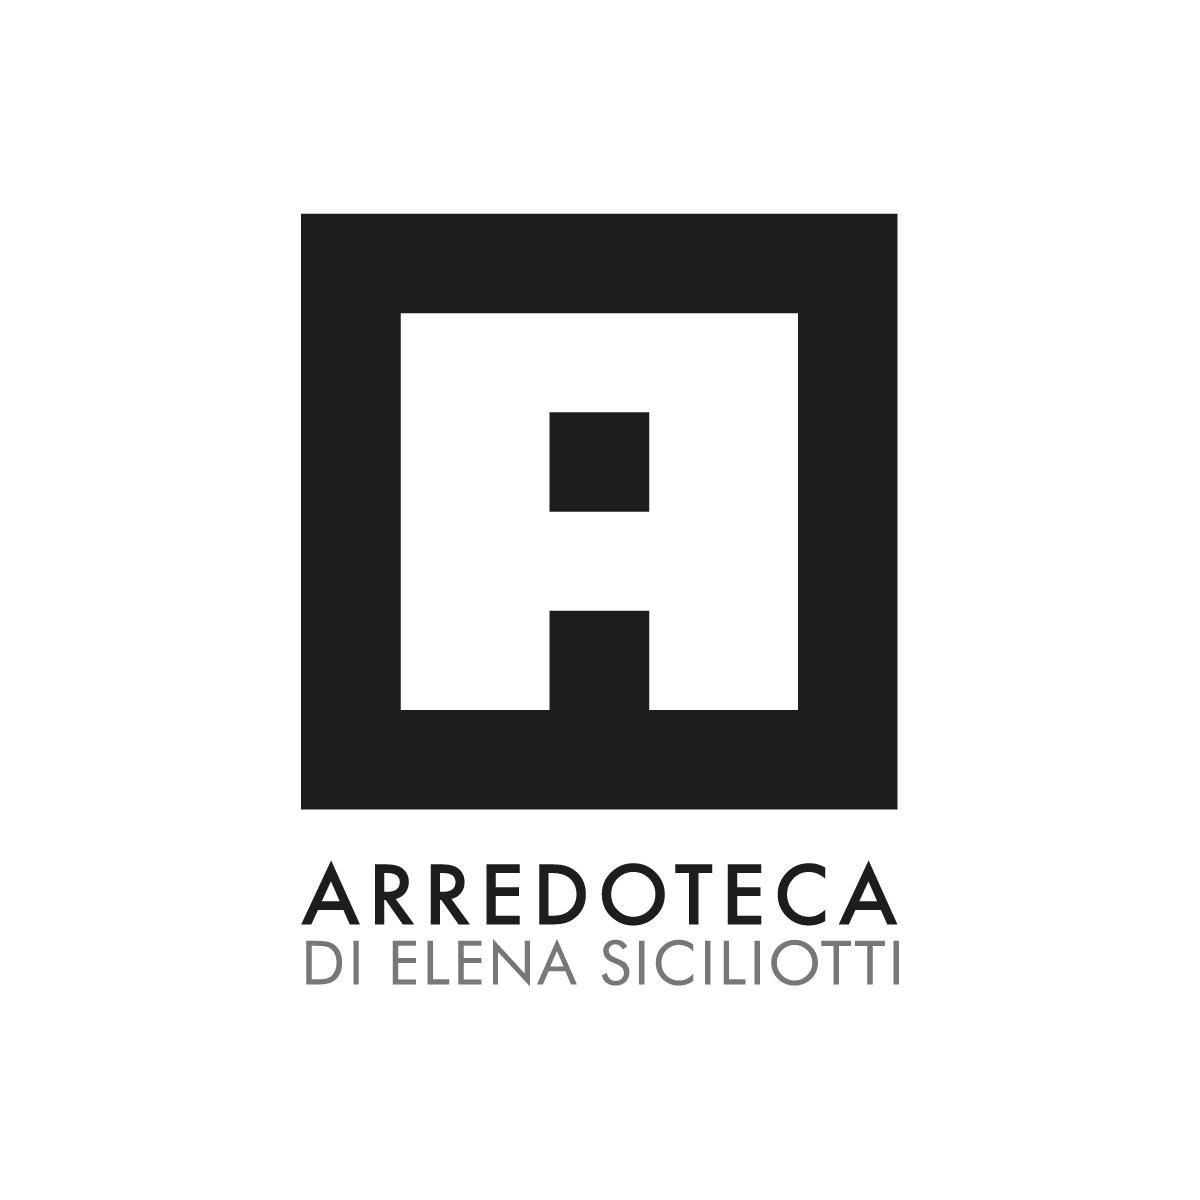 Arredoteca, Logo